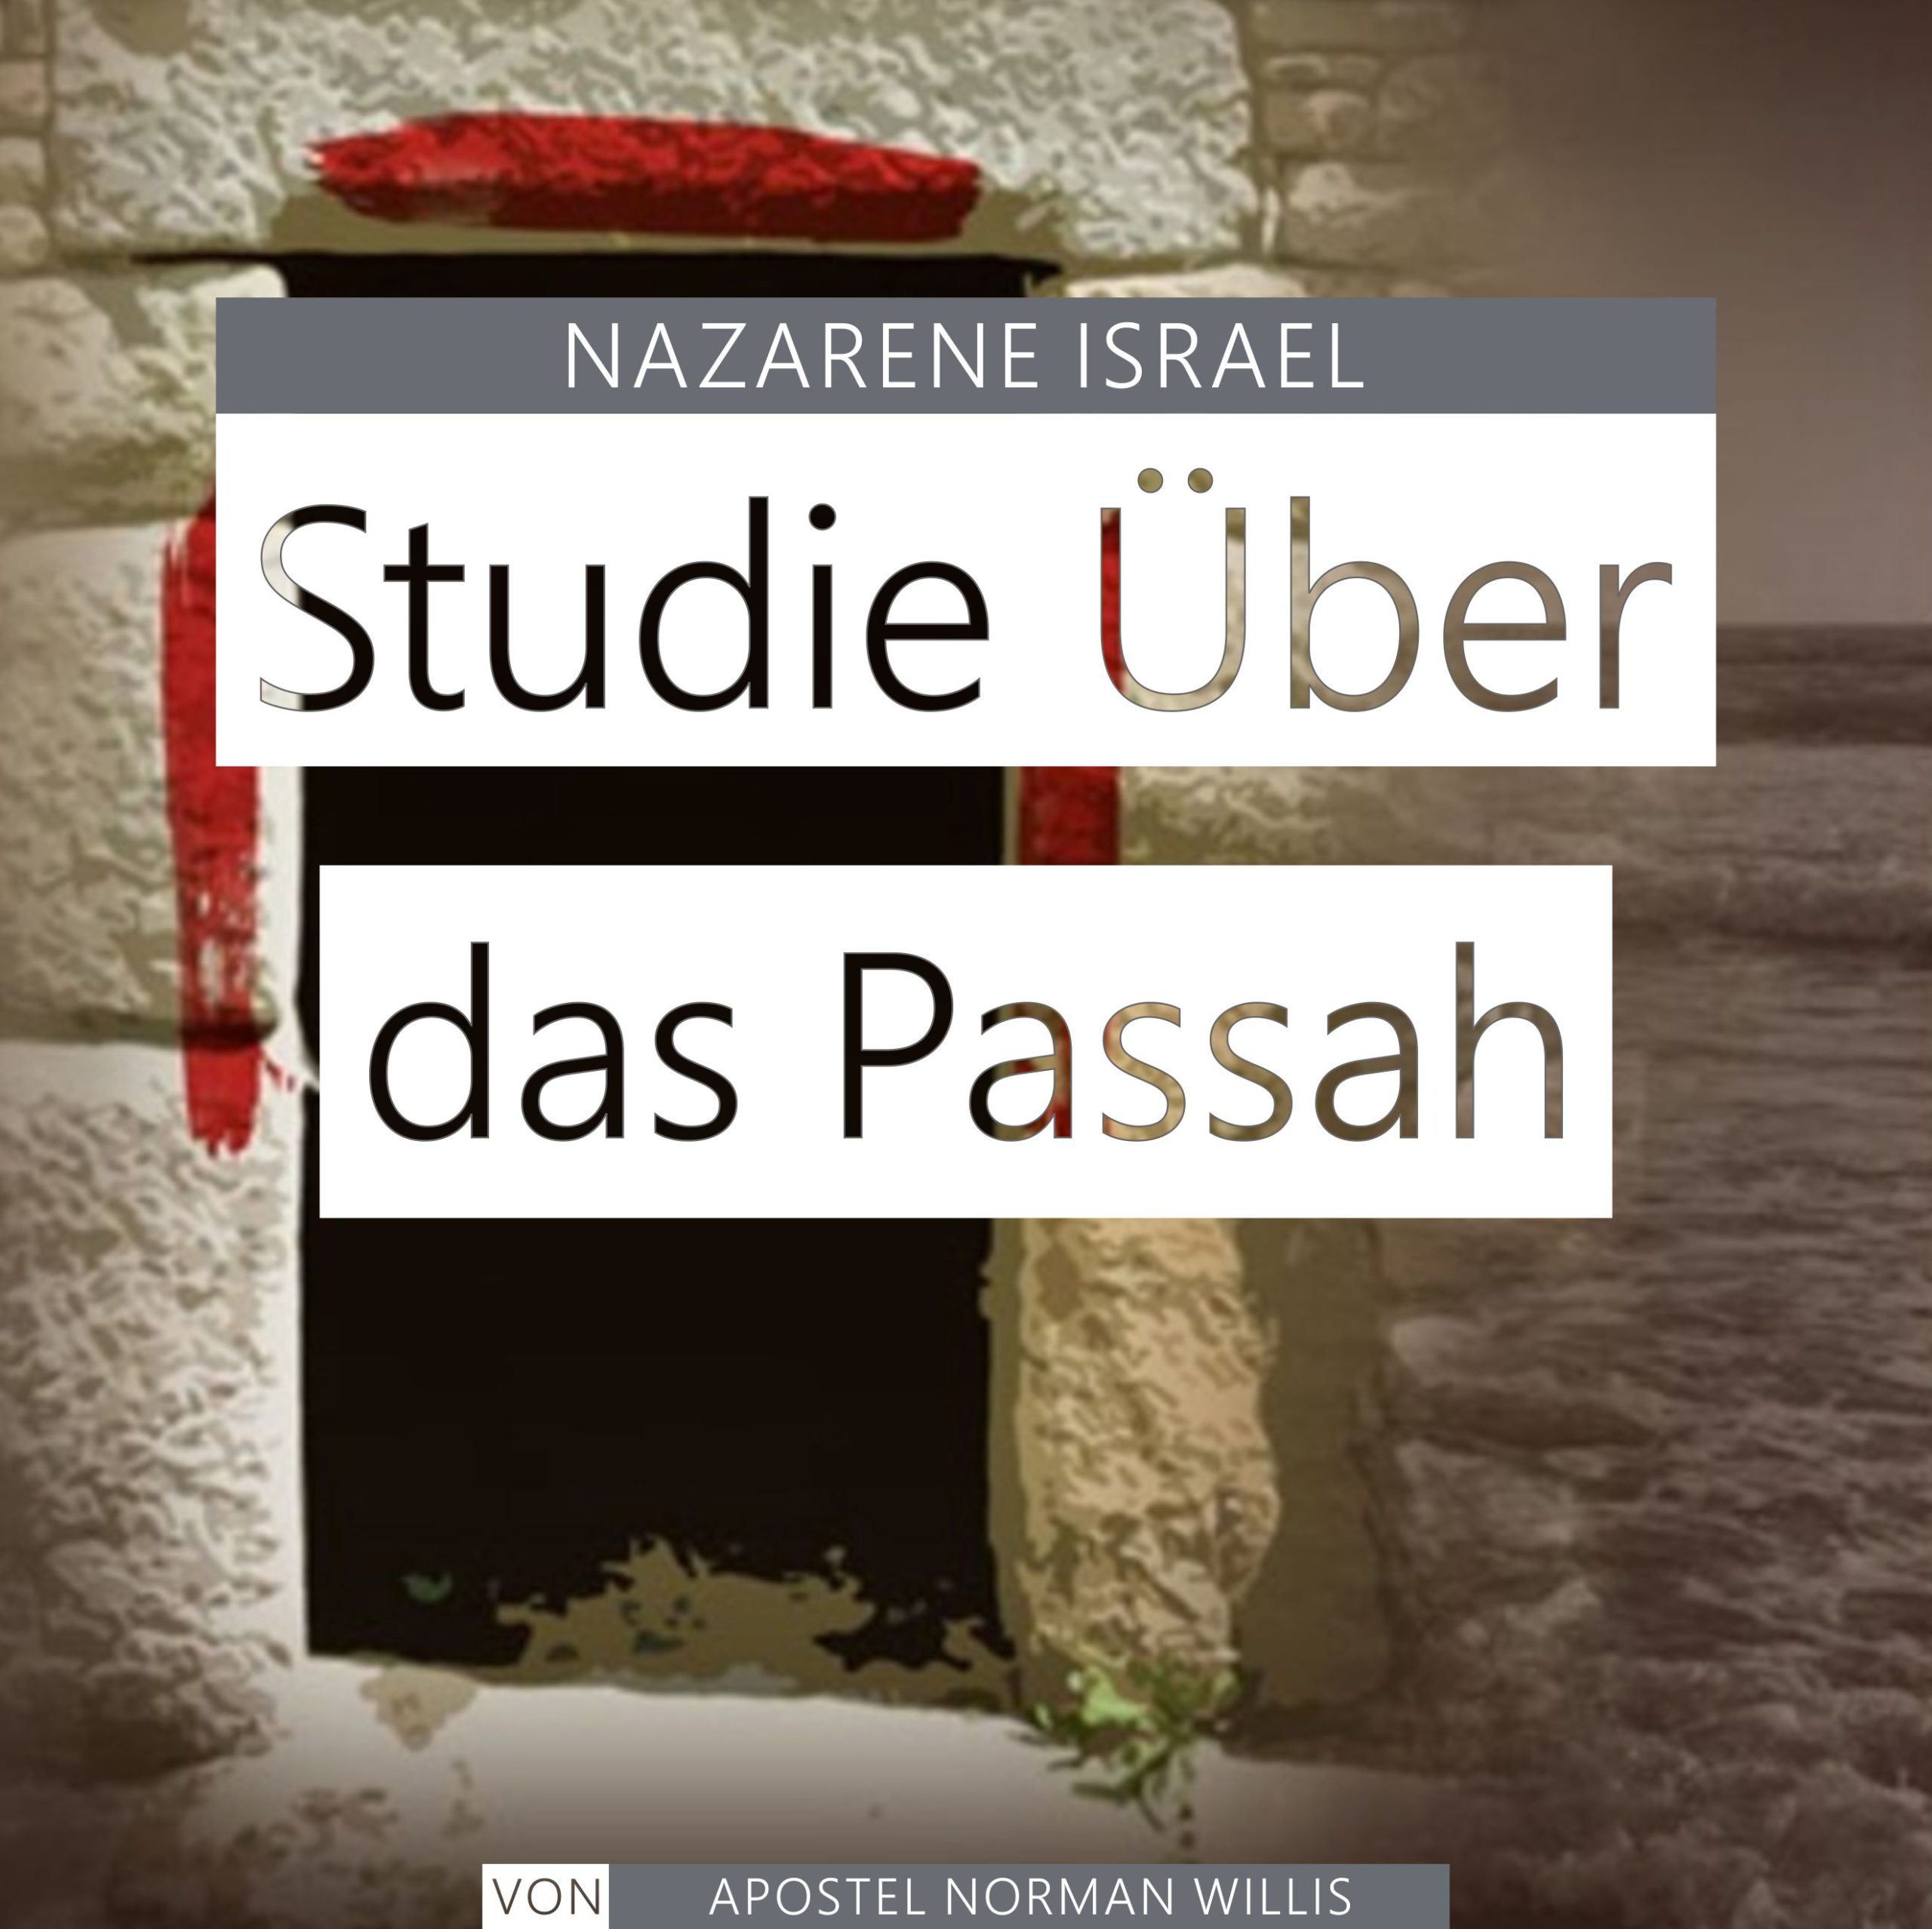 Nazarener Studie Über das Passah